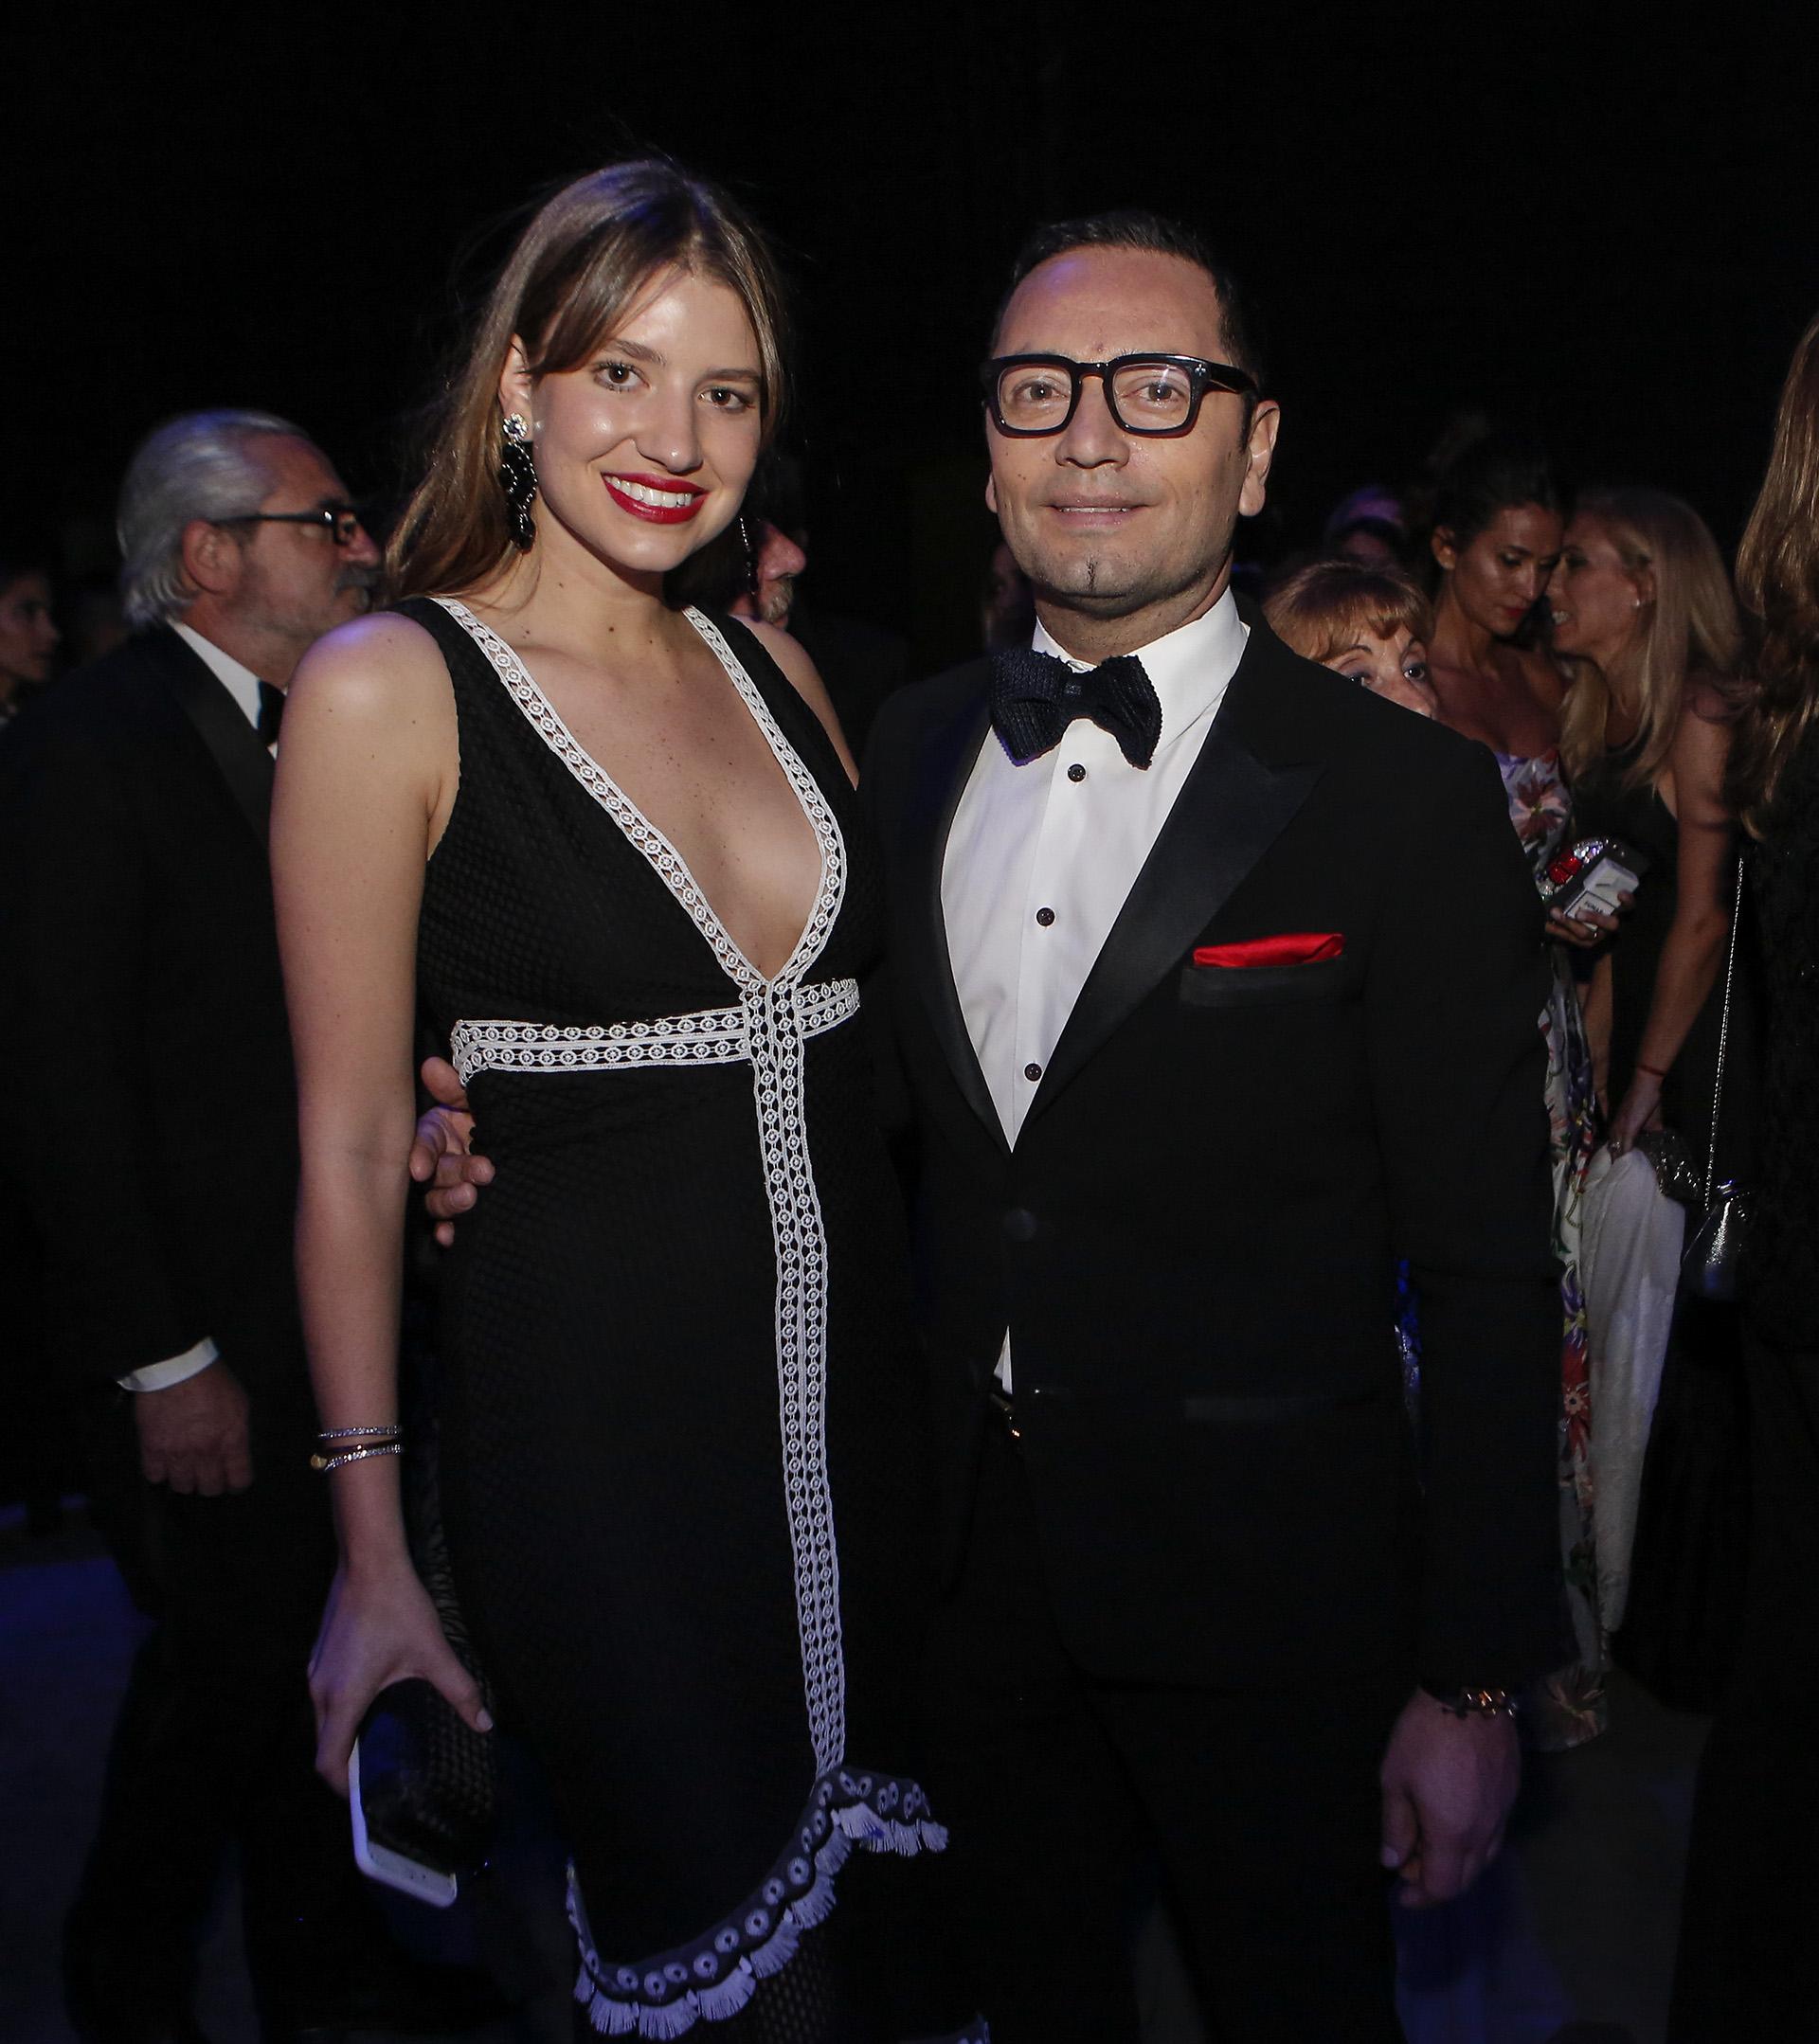 Angie Landaburu y Fabián Medina Flores